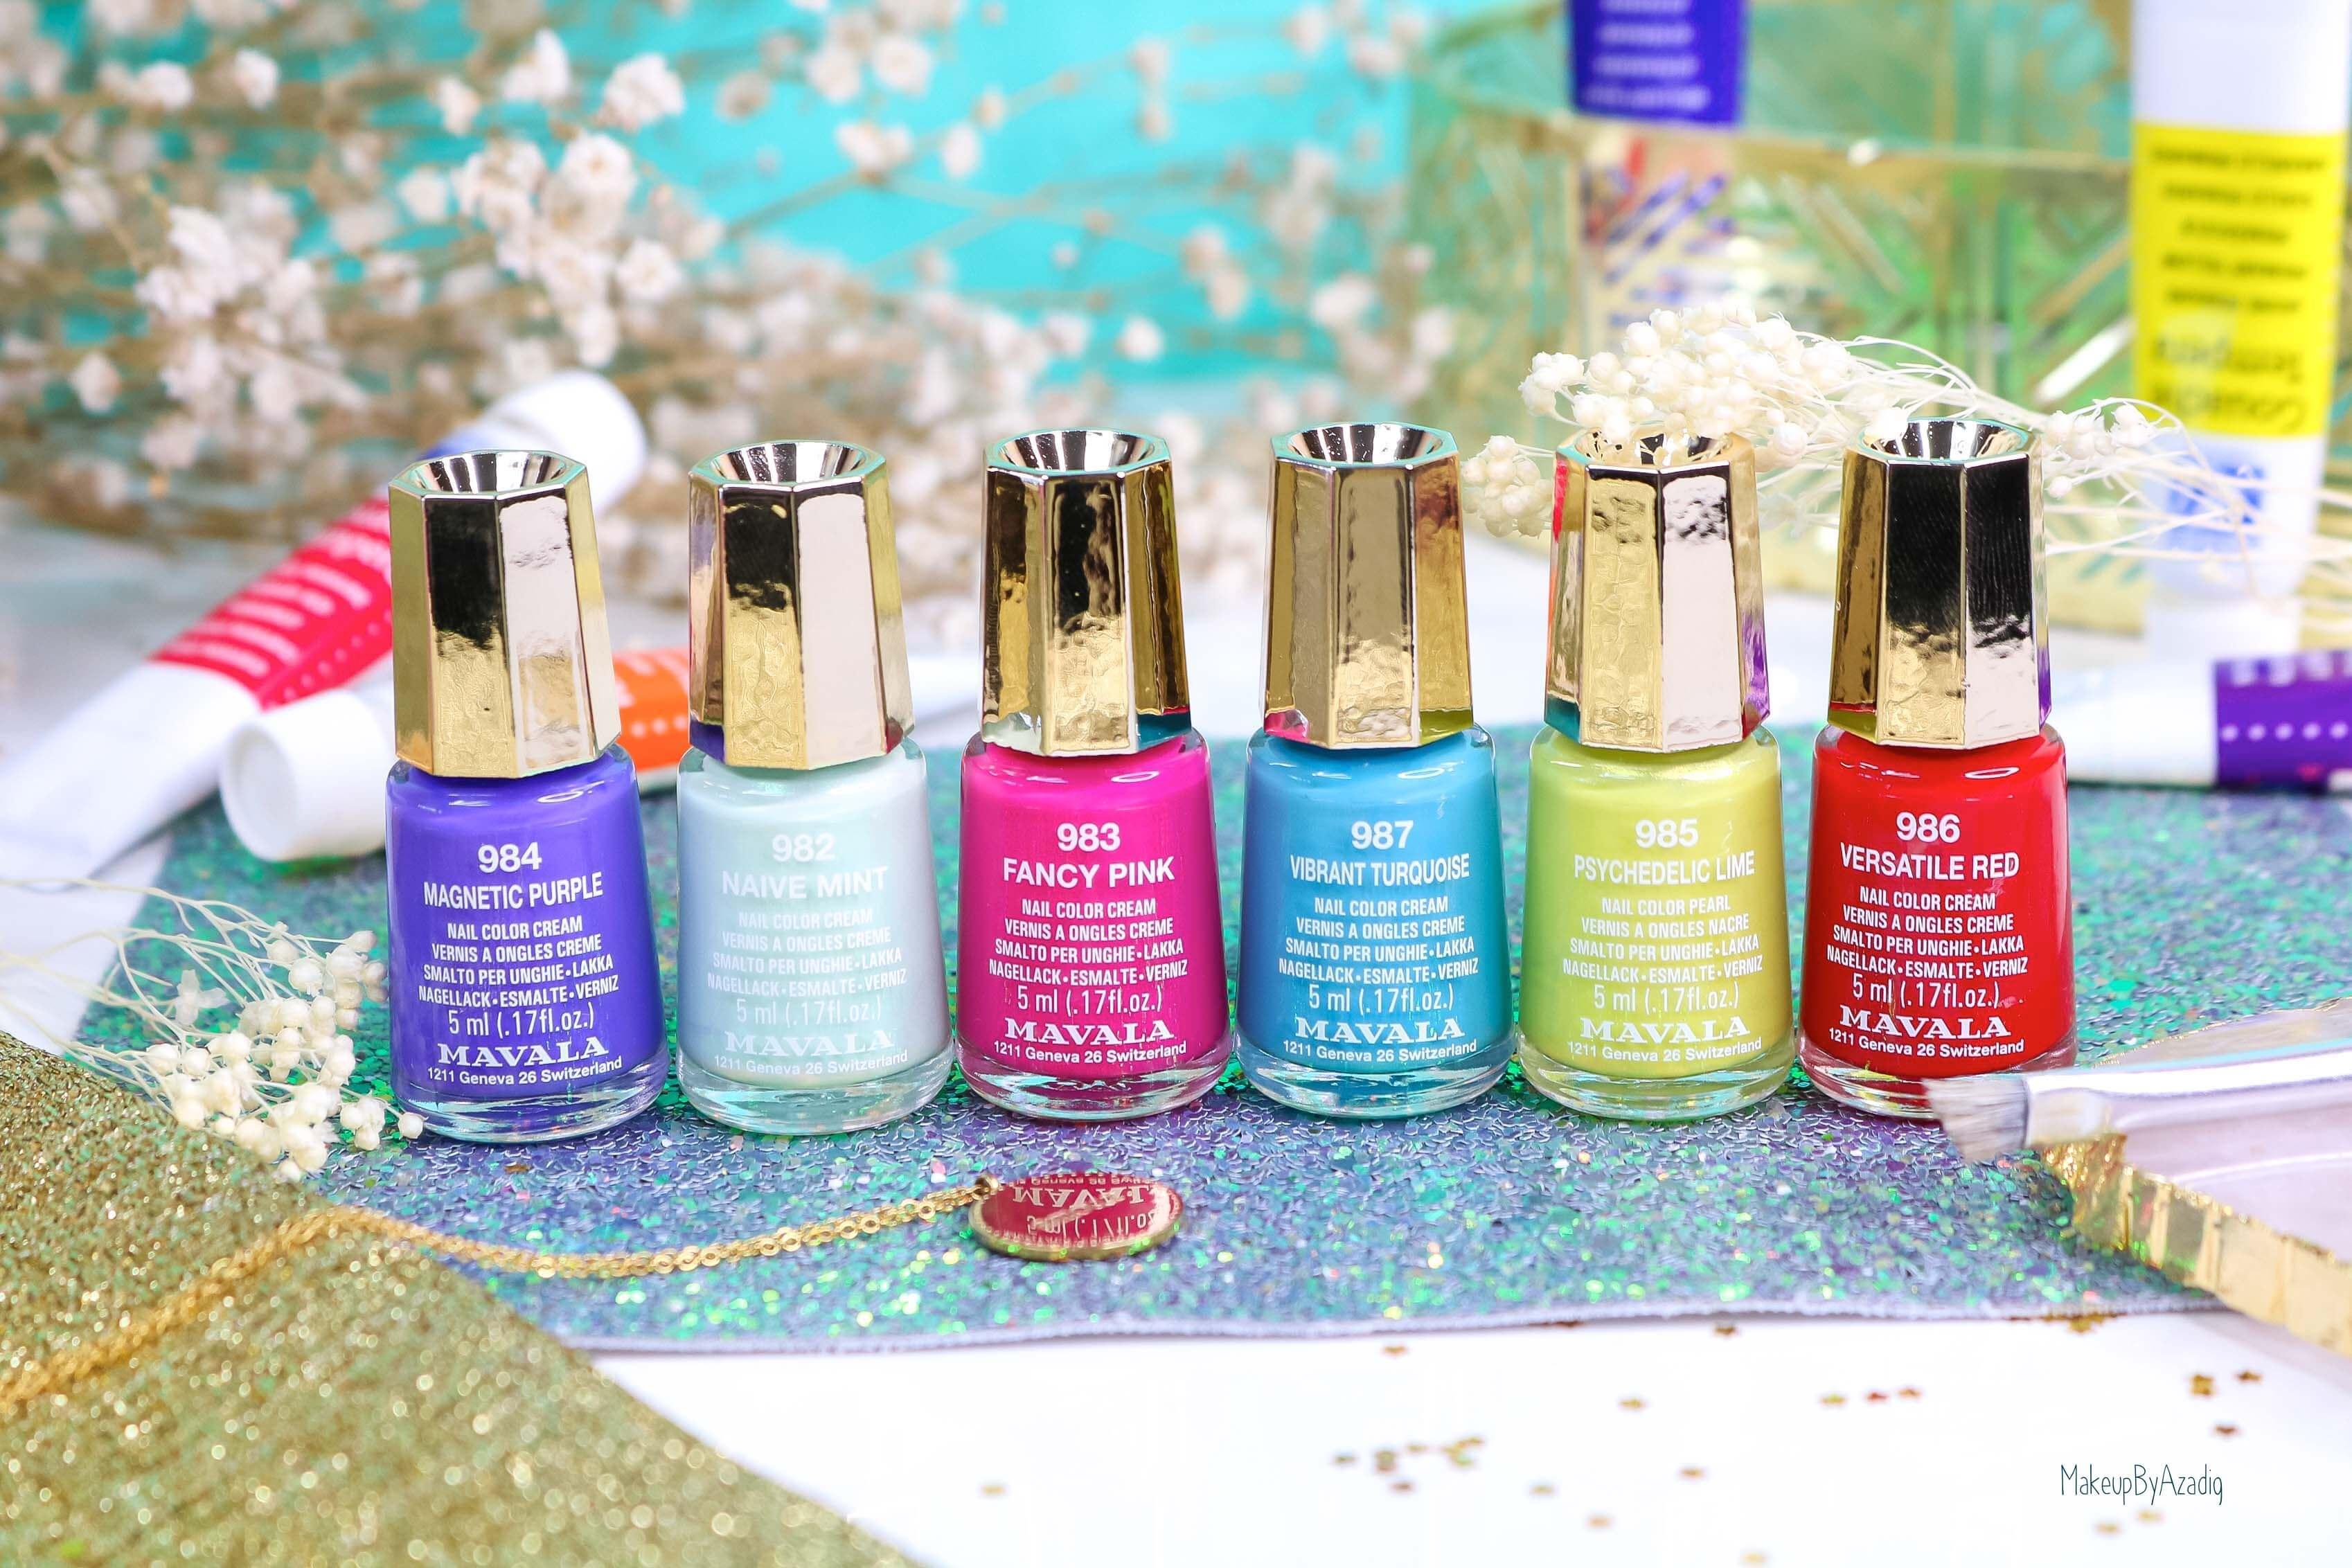 revue-collection-vernis-mavala-nails-dash-splash-ete-2019-bleu-orange-makeupbyazadig-swatch-avis-prix-meilleur